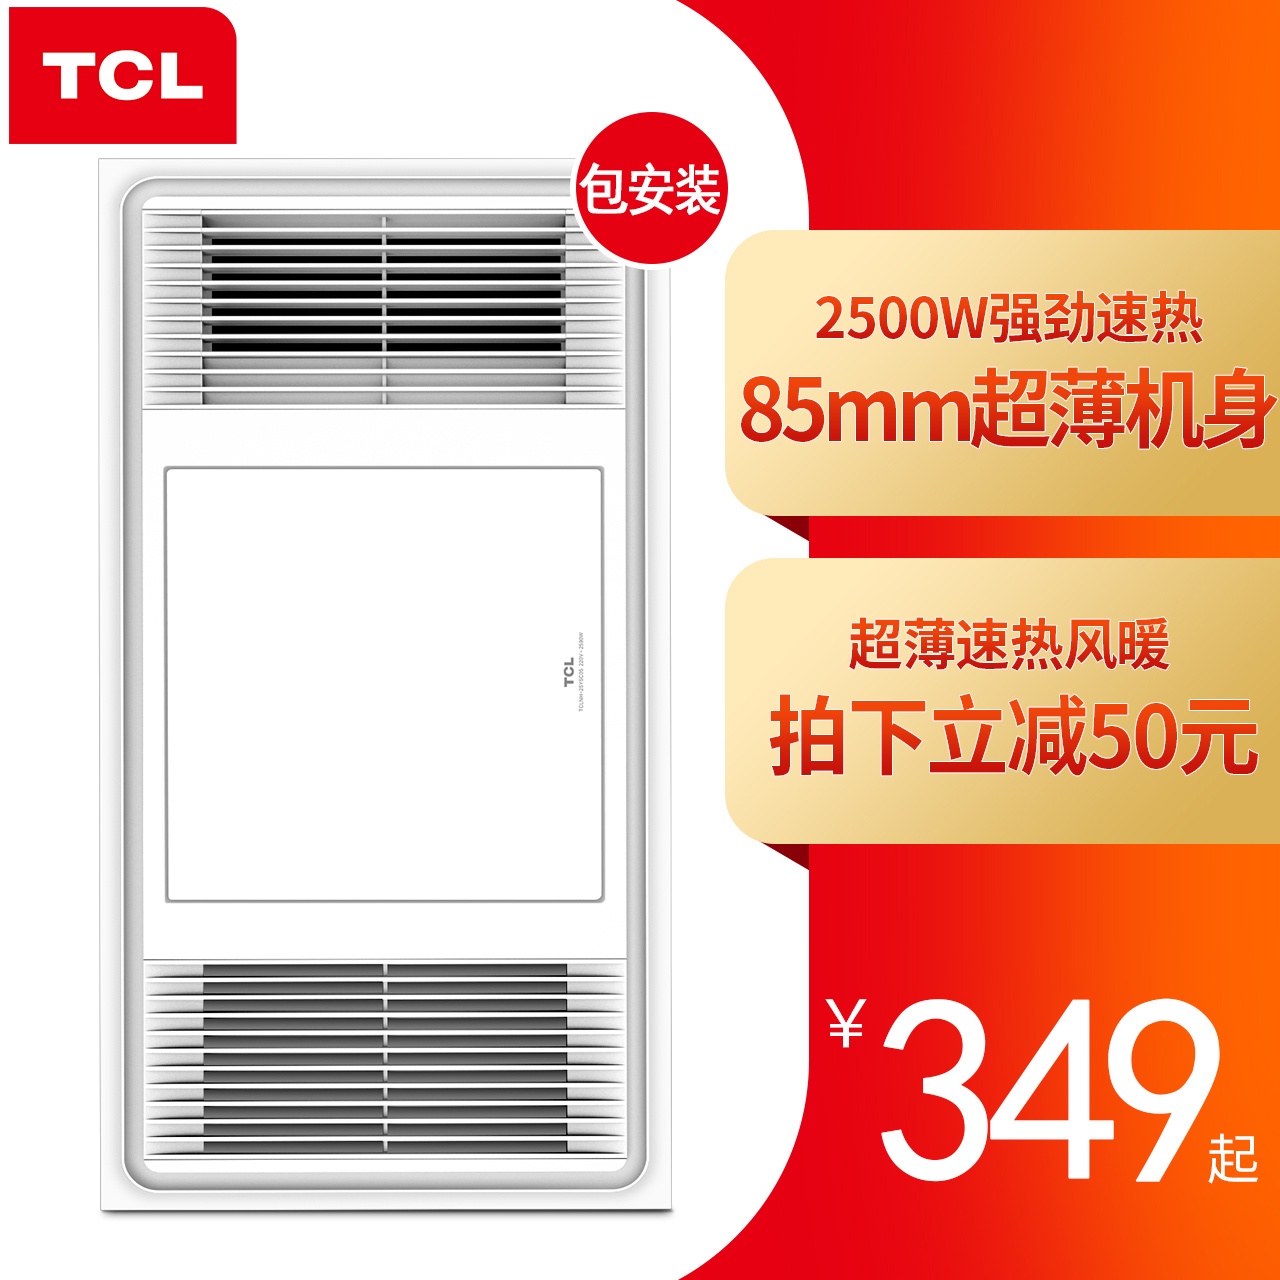 TCL室内加热器TCLNH-26Y5C01浴霸